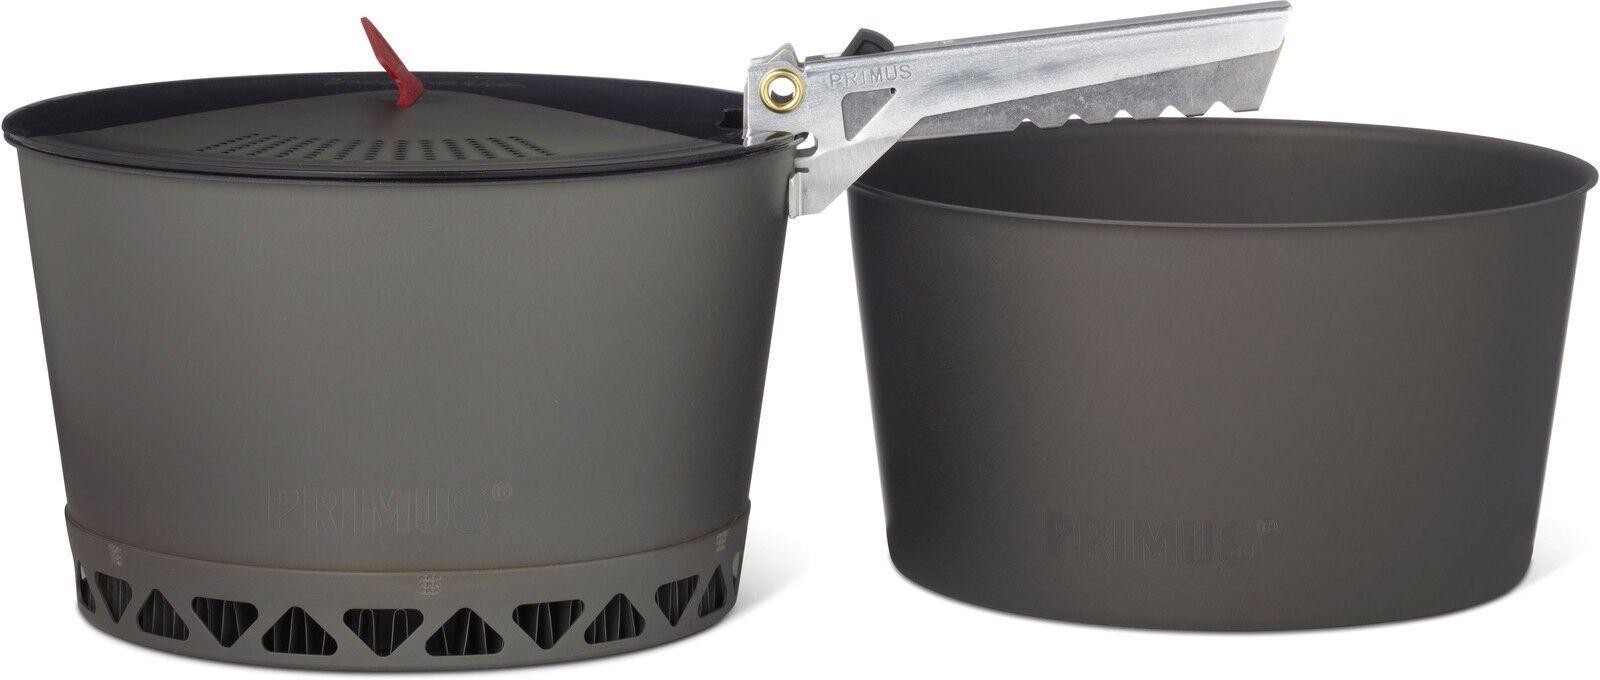 PRIMUS PrimeTech Pot Set 2.3L Campingkochtopf-Set P740390  | New Style